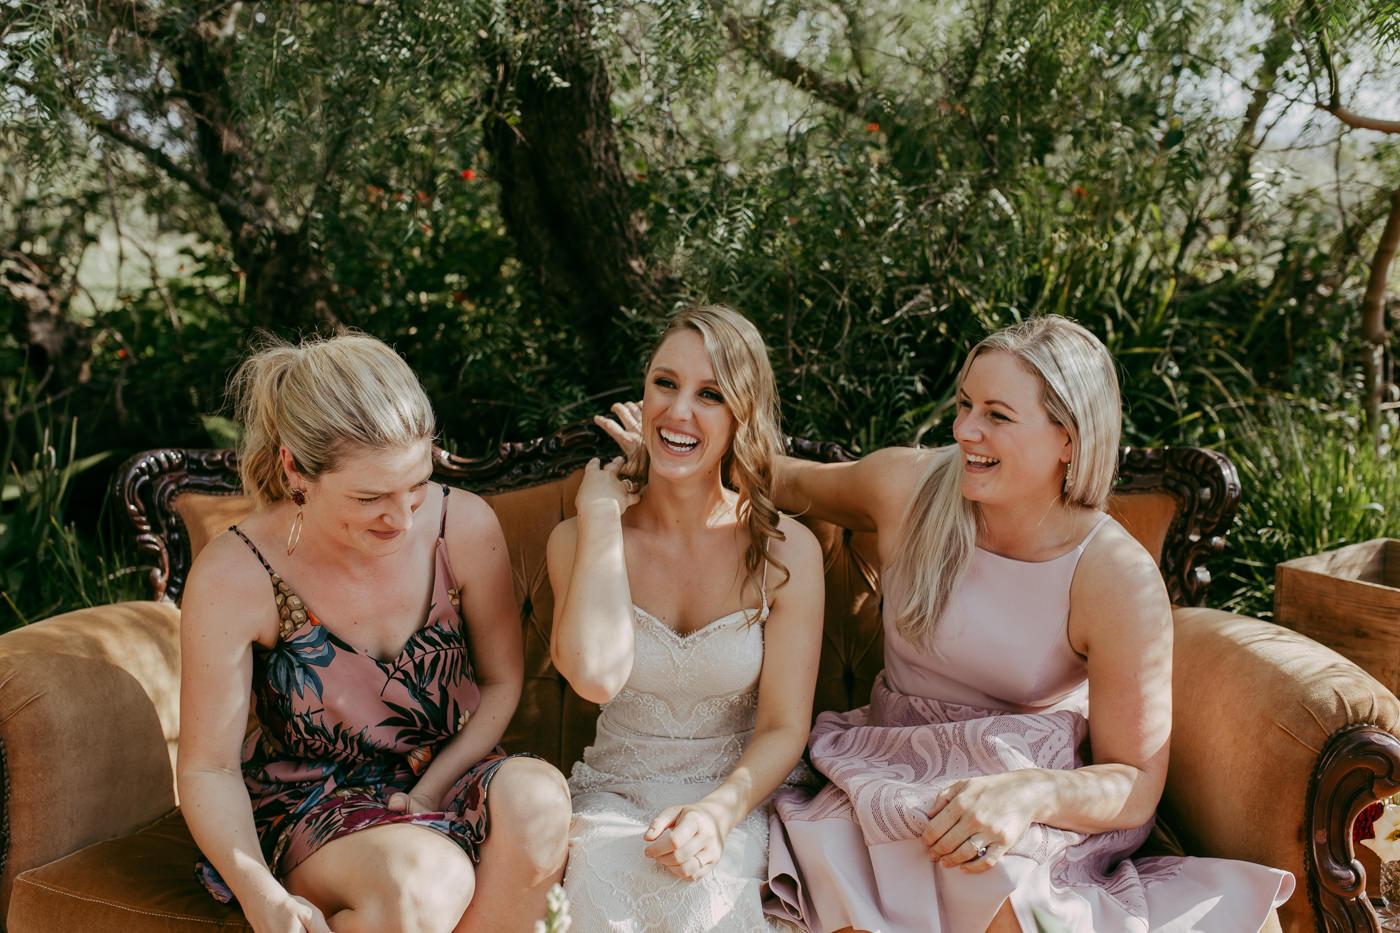 Anthony & Eliet - Wagga Wagga Wedding - Country NSW - Samantha Heather Photography-120.jpg